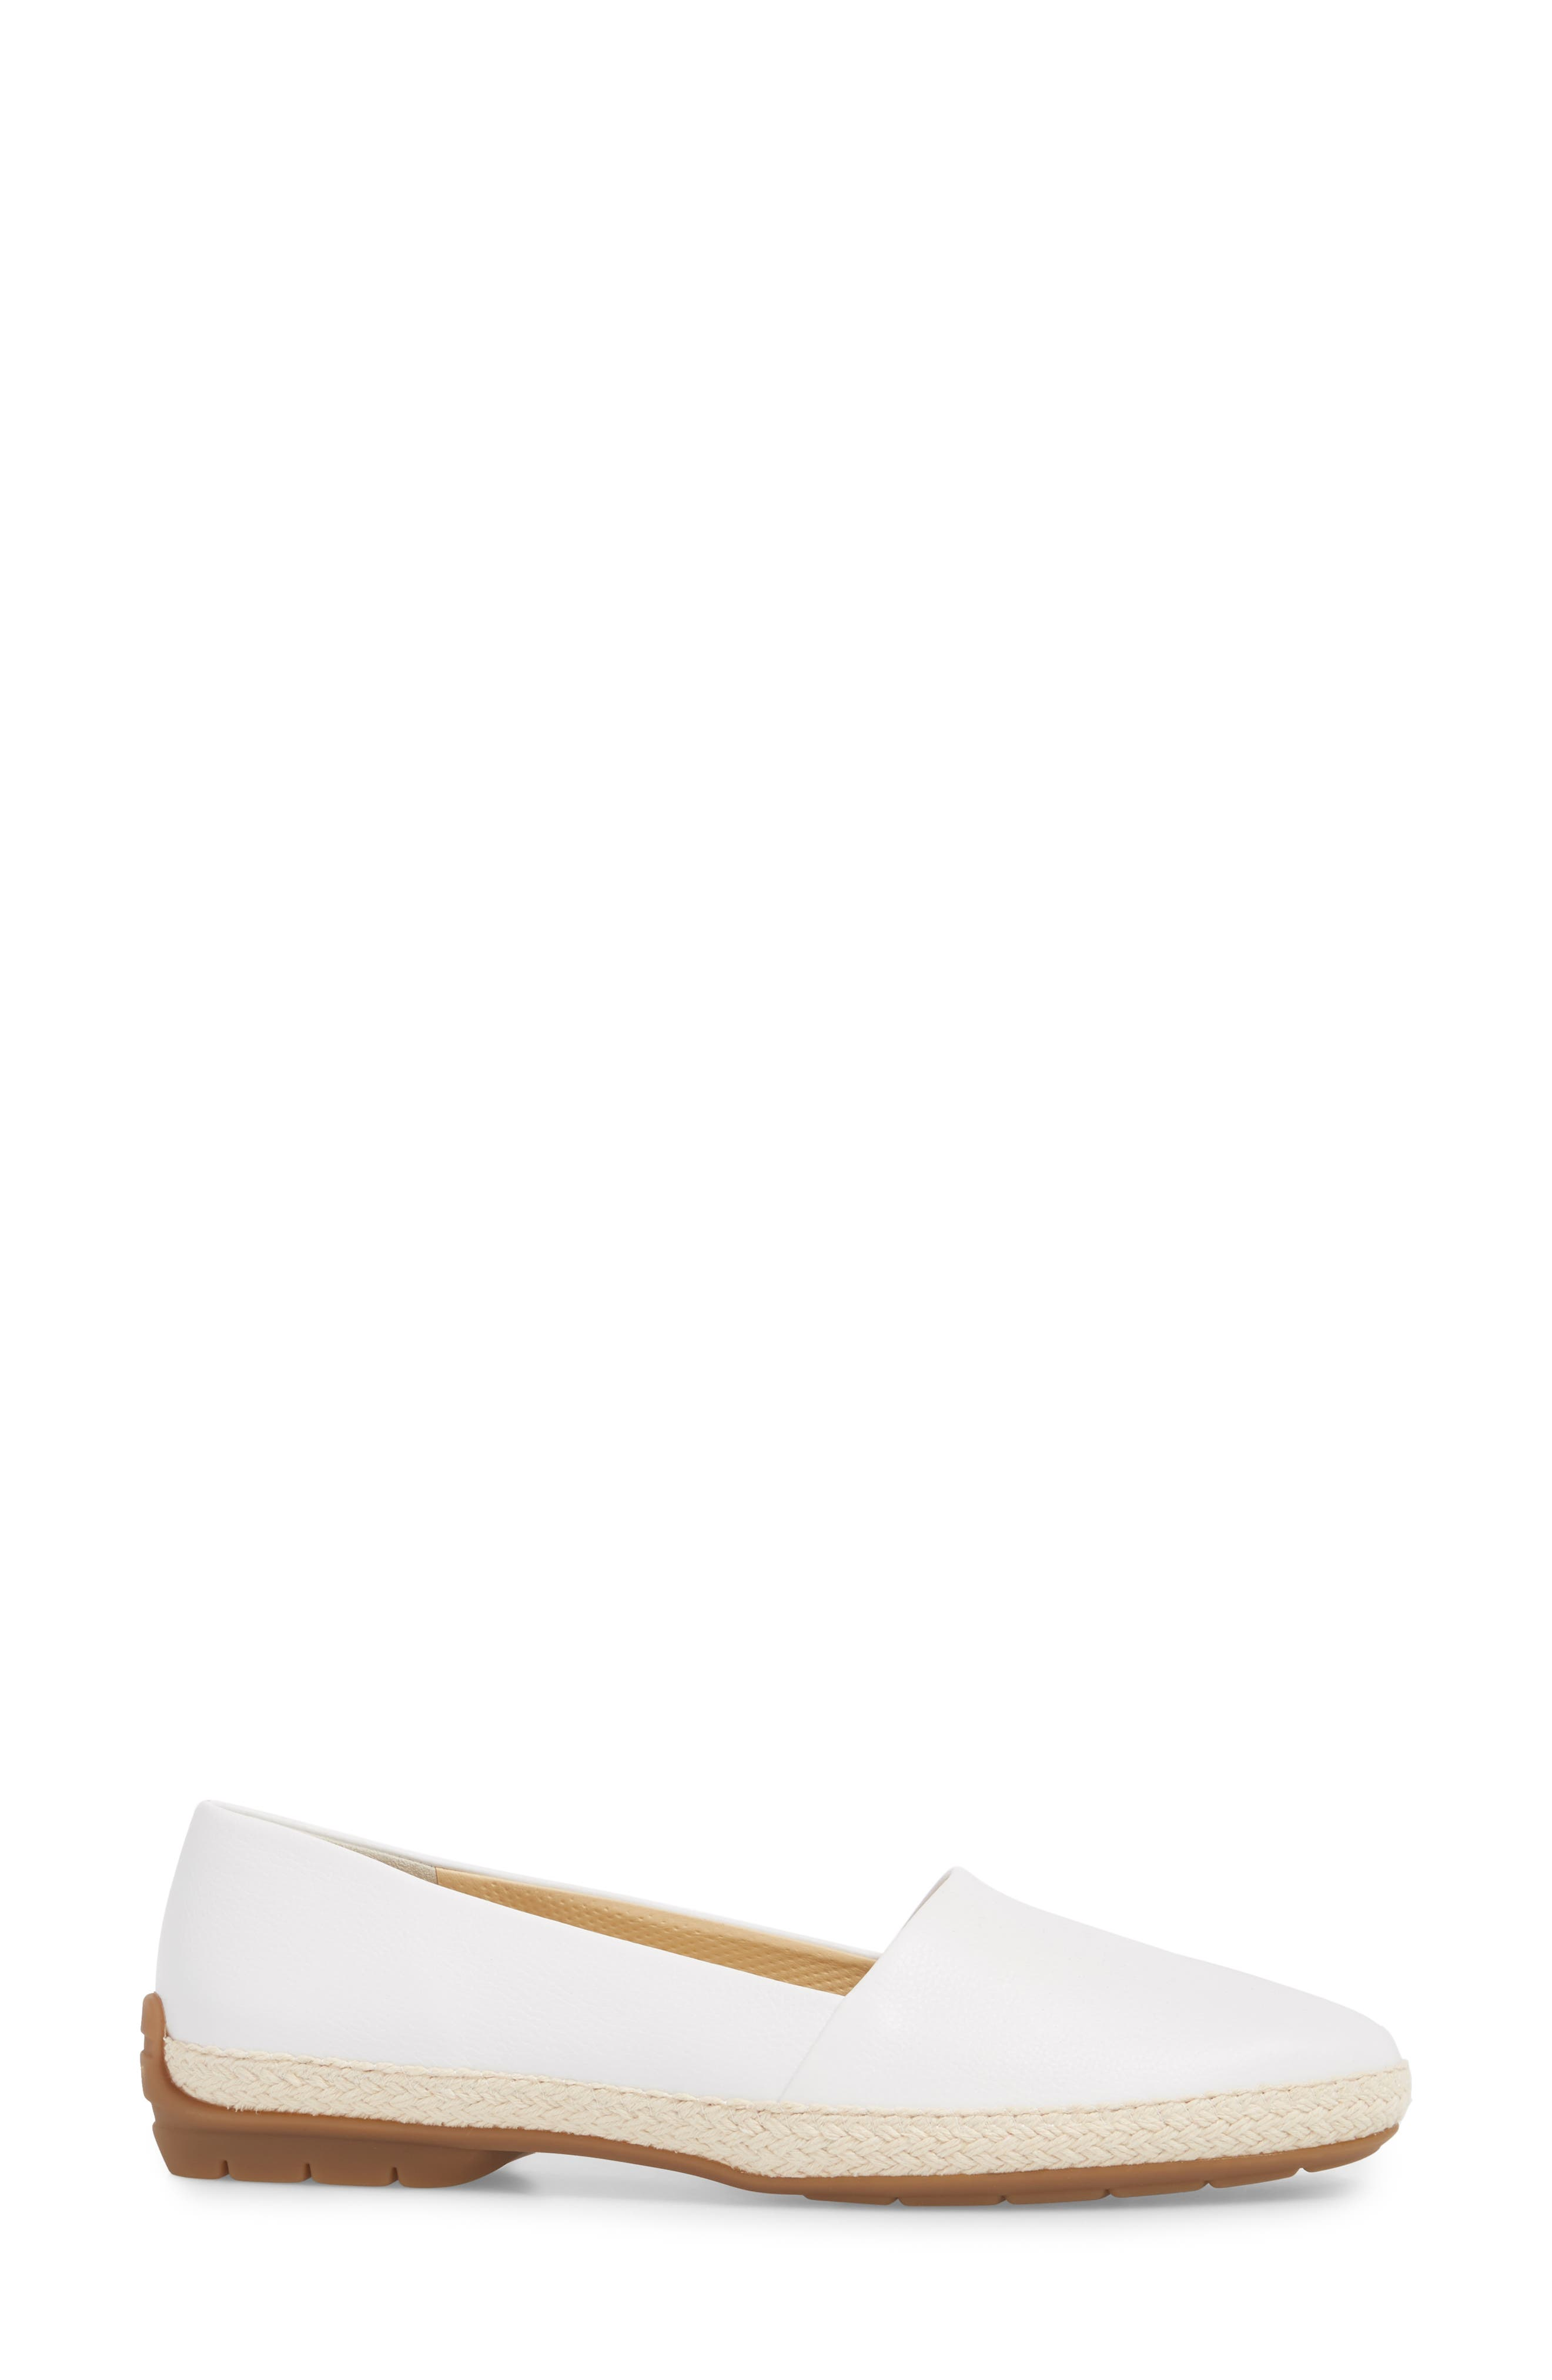 Roxy Espadrille,                             Alternate thumbnail 3, color,                             White Leather